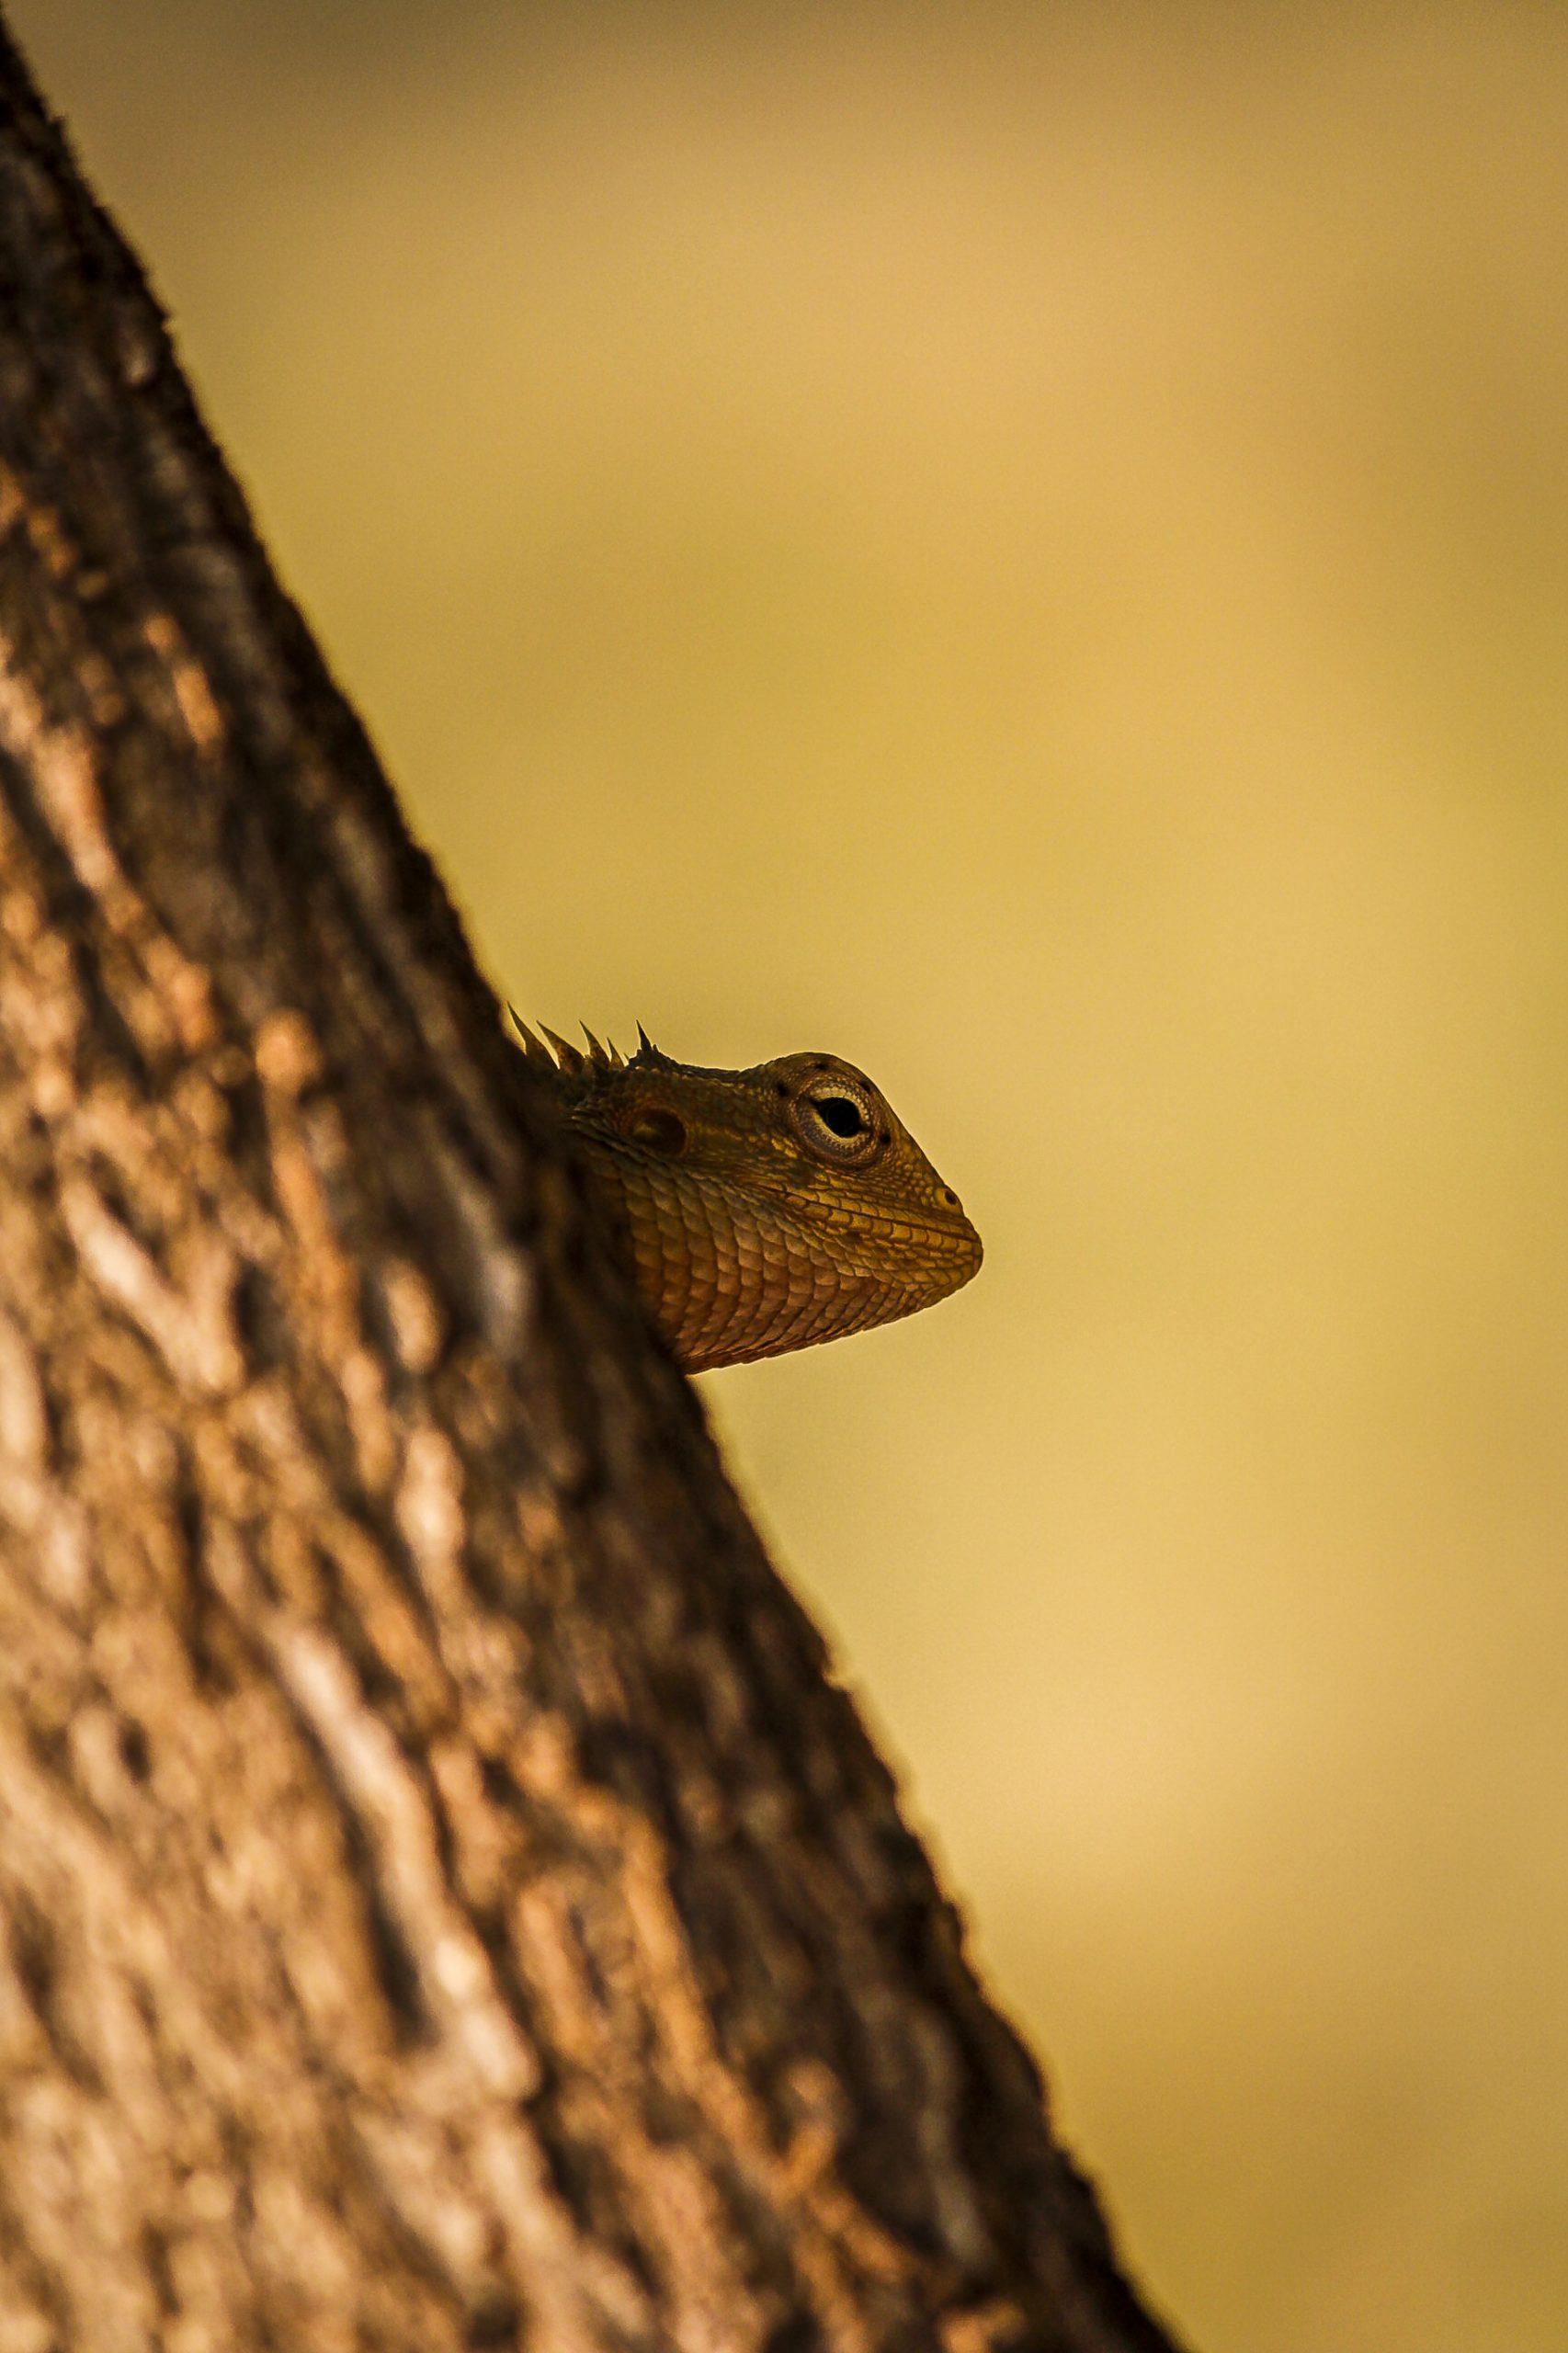 Dragon lizard peeking from behind the tree